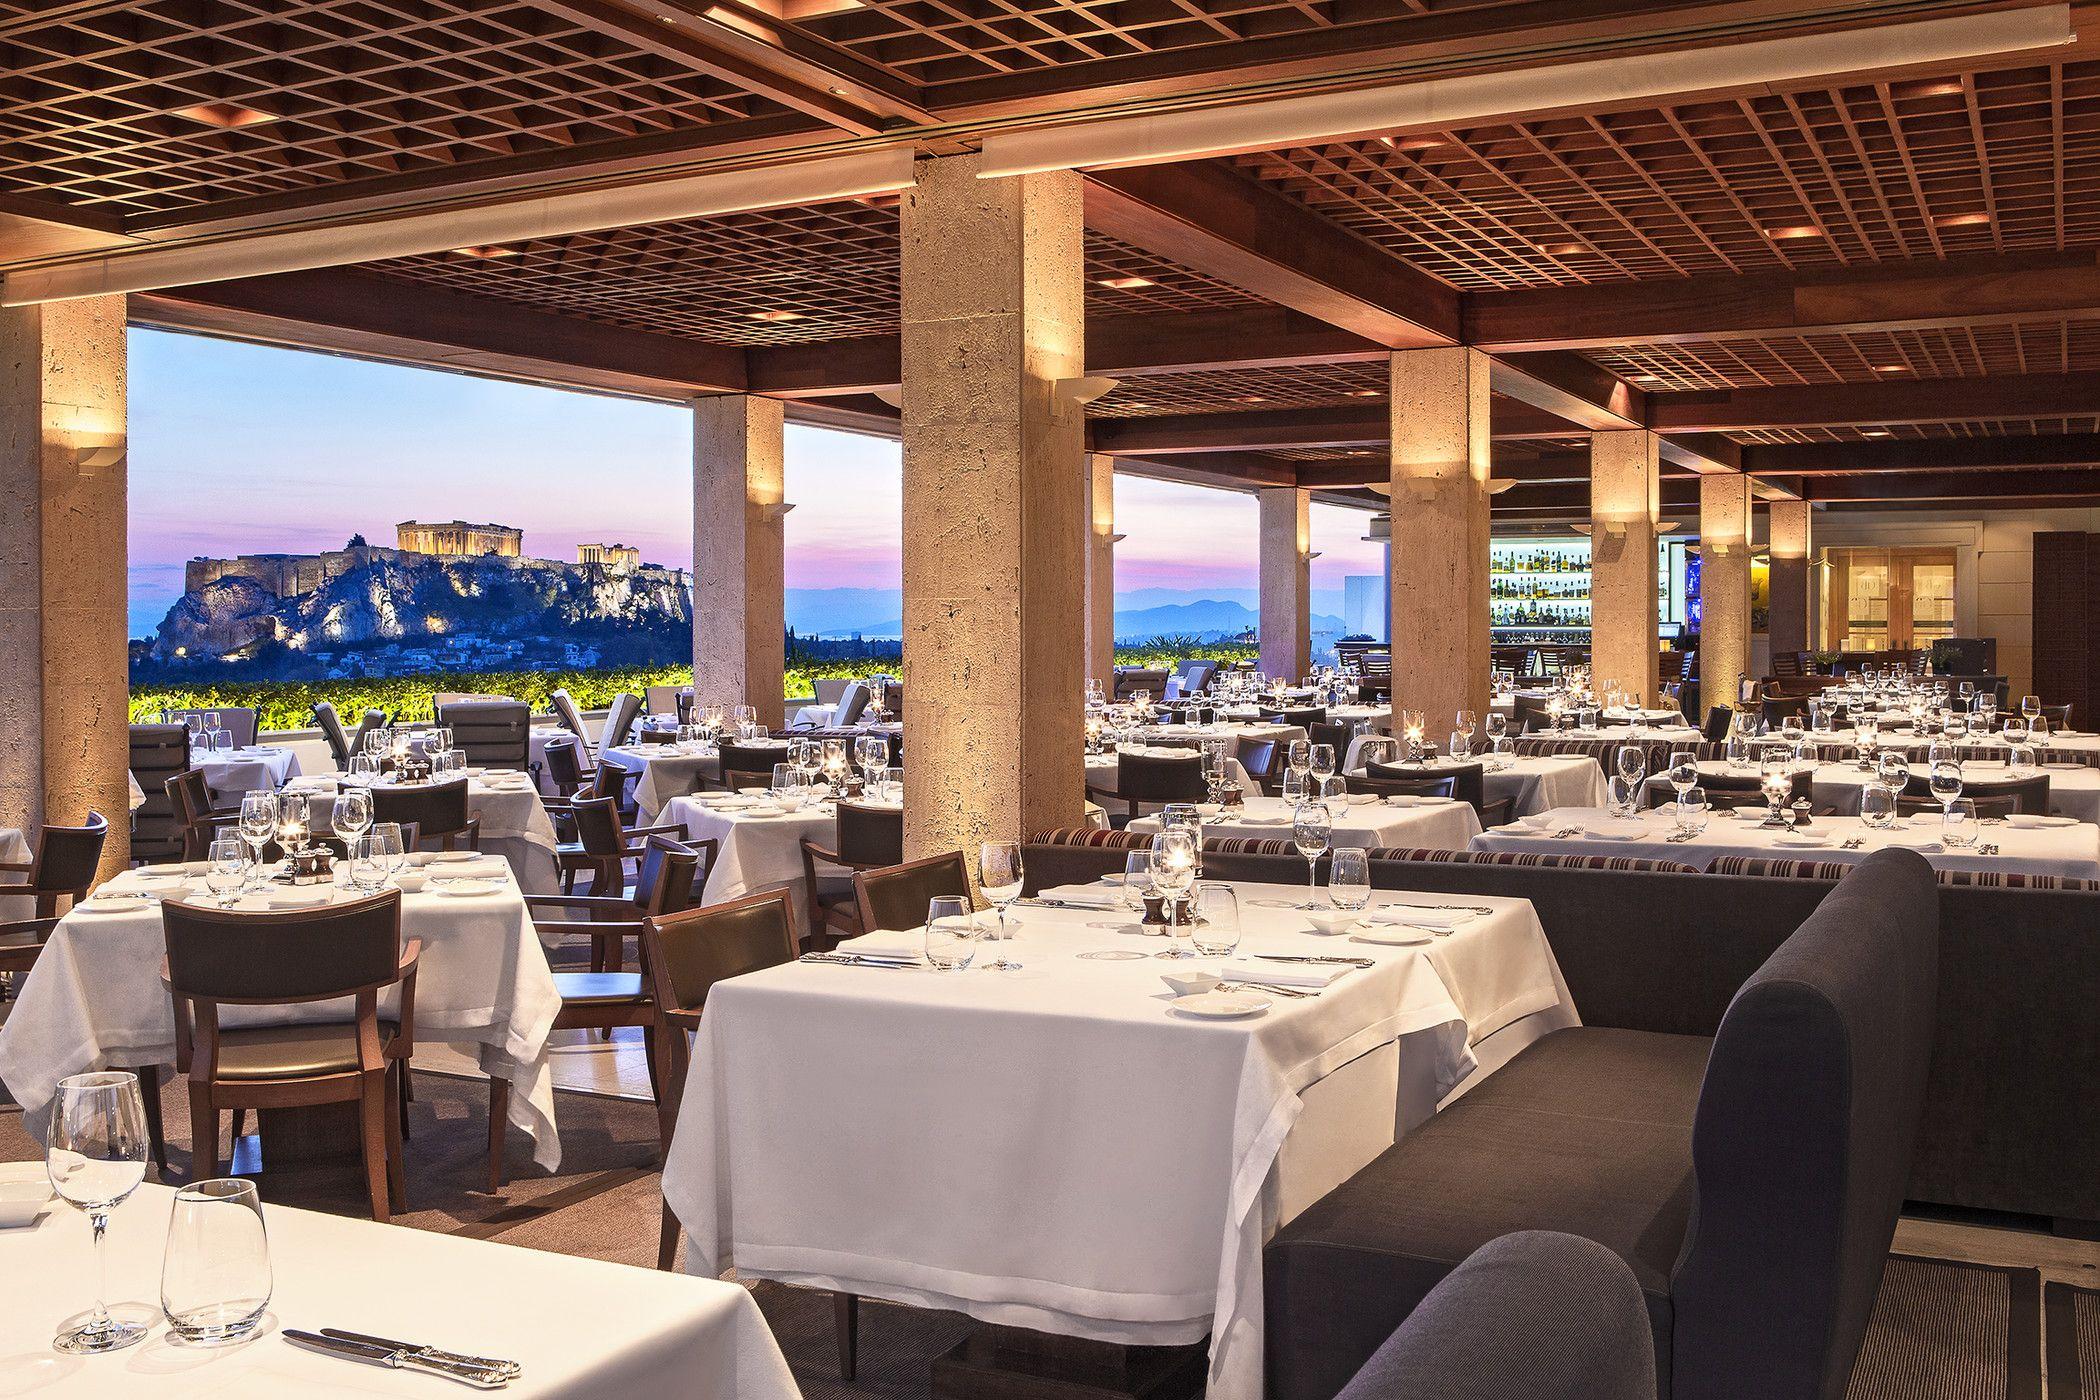 lux101re-195748-GB Roof Garden Restaurant